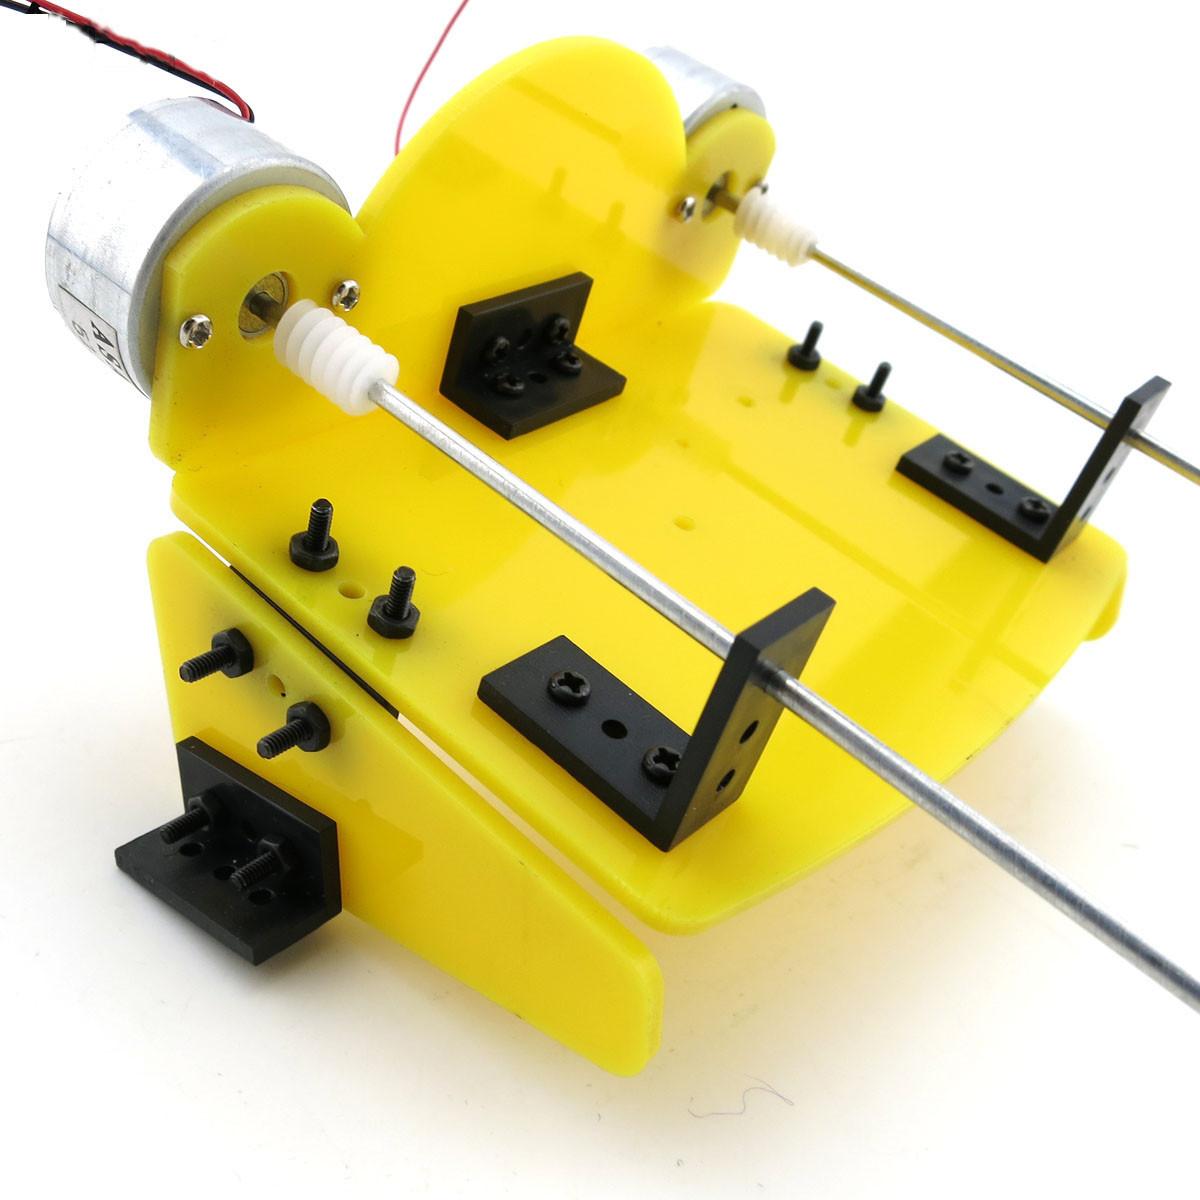 Electric Outboard Motor Kit: DIY Electric Propeller Model Kit Boat Ship Hobby Motor